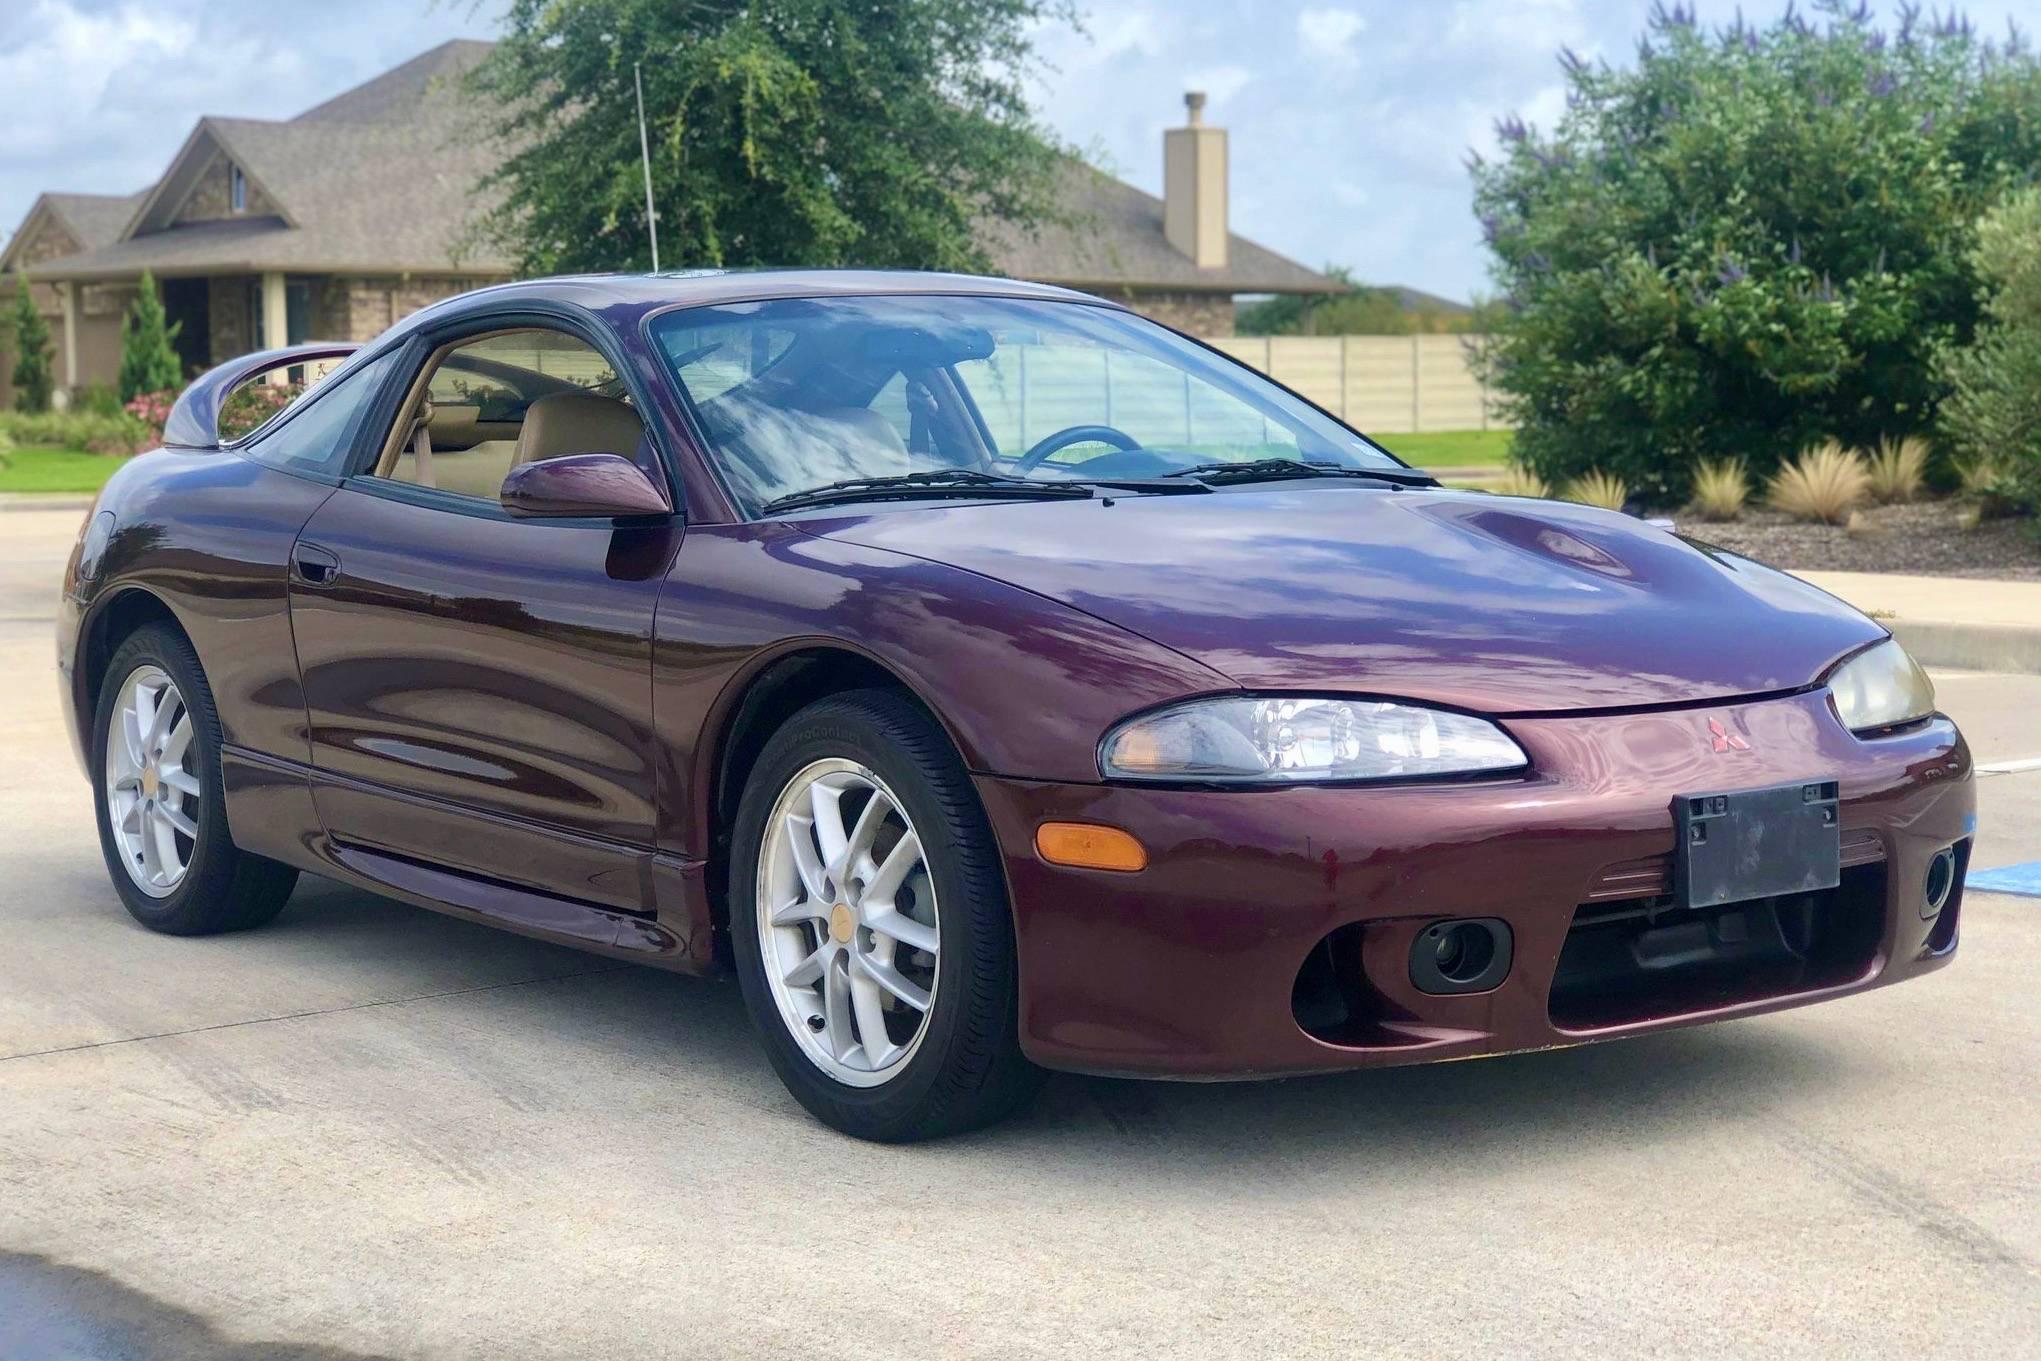 1999 Mitsubishi Eclipse Gsx Auction Cars Bids